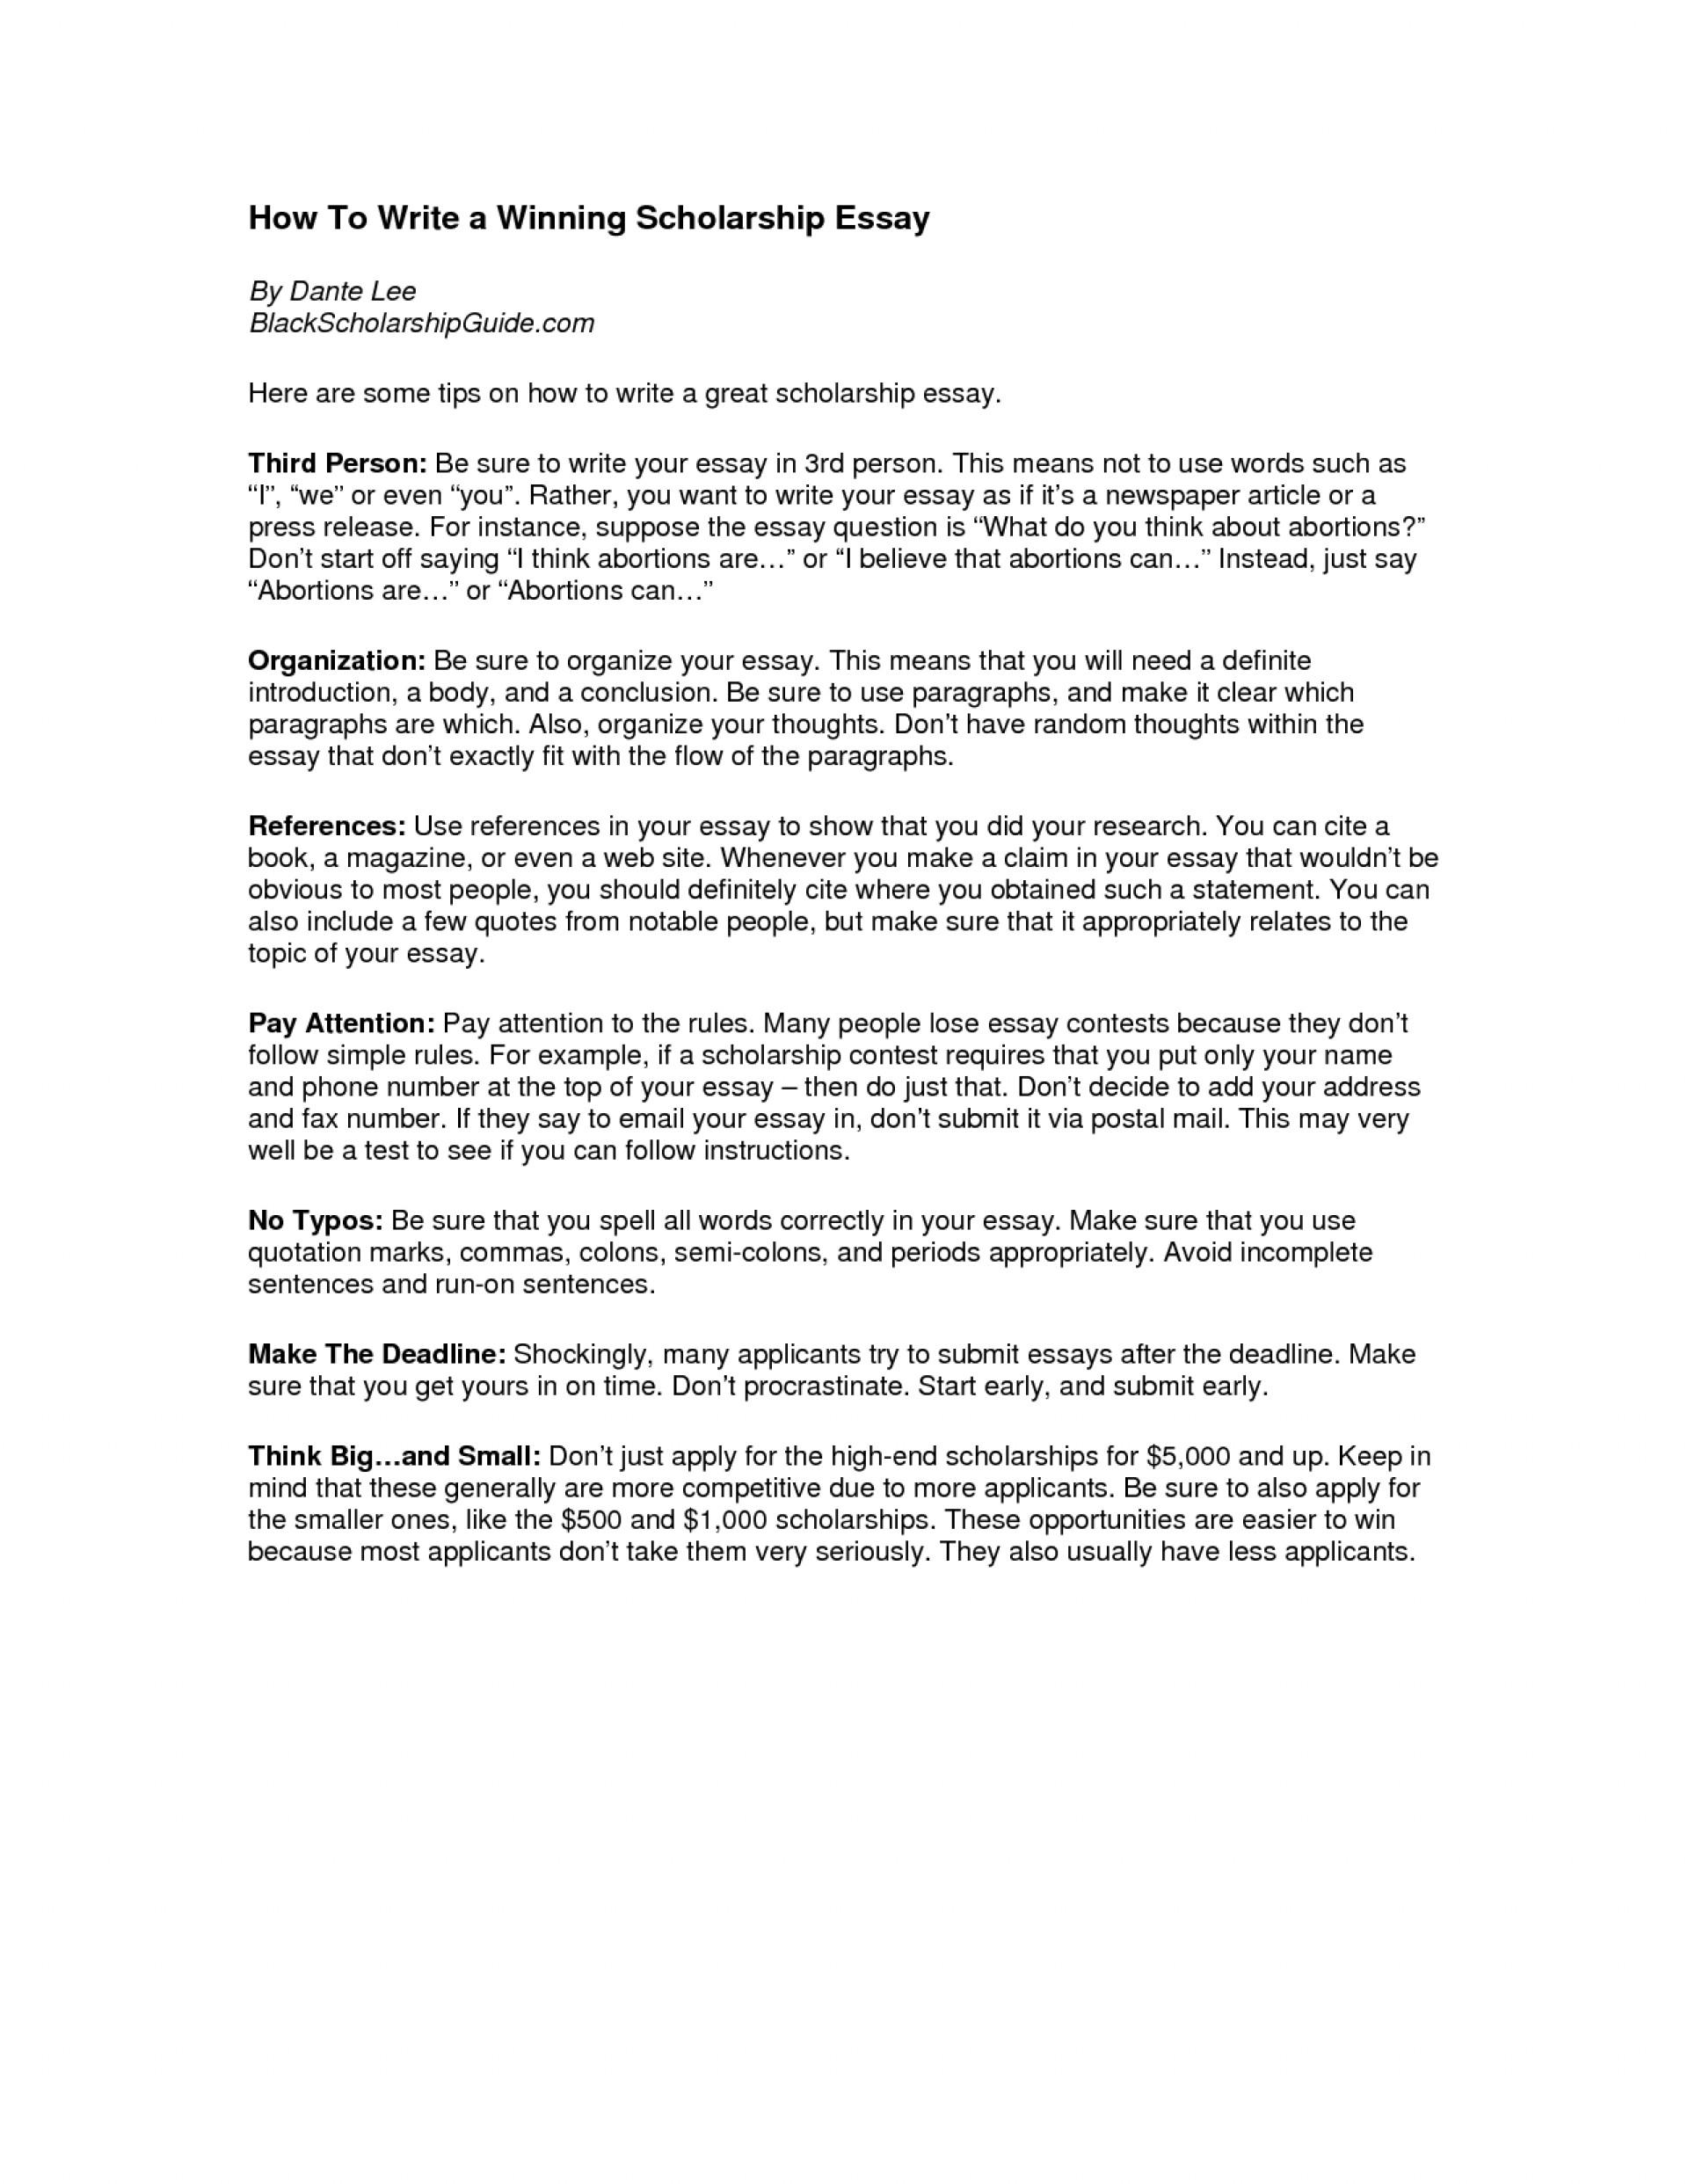 008 Zmemxteu5z Example Scholarships Phenomenal Scholarship Essays Sample For Masters 500 Words Nursing 1920